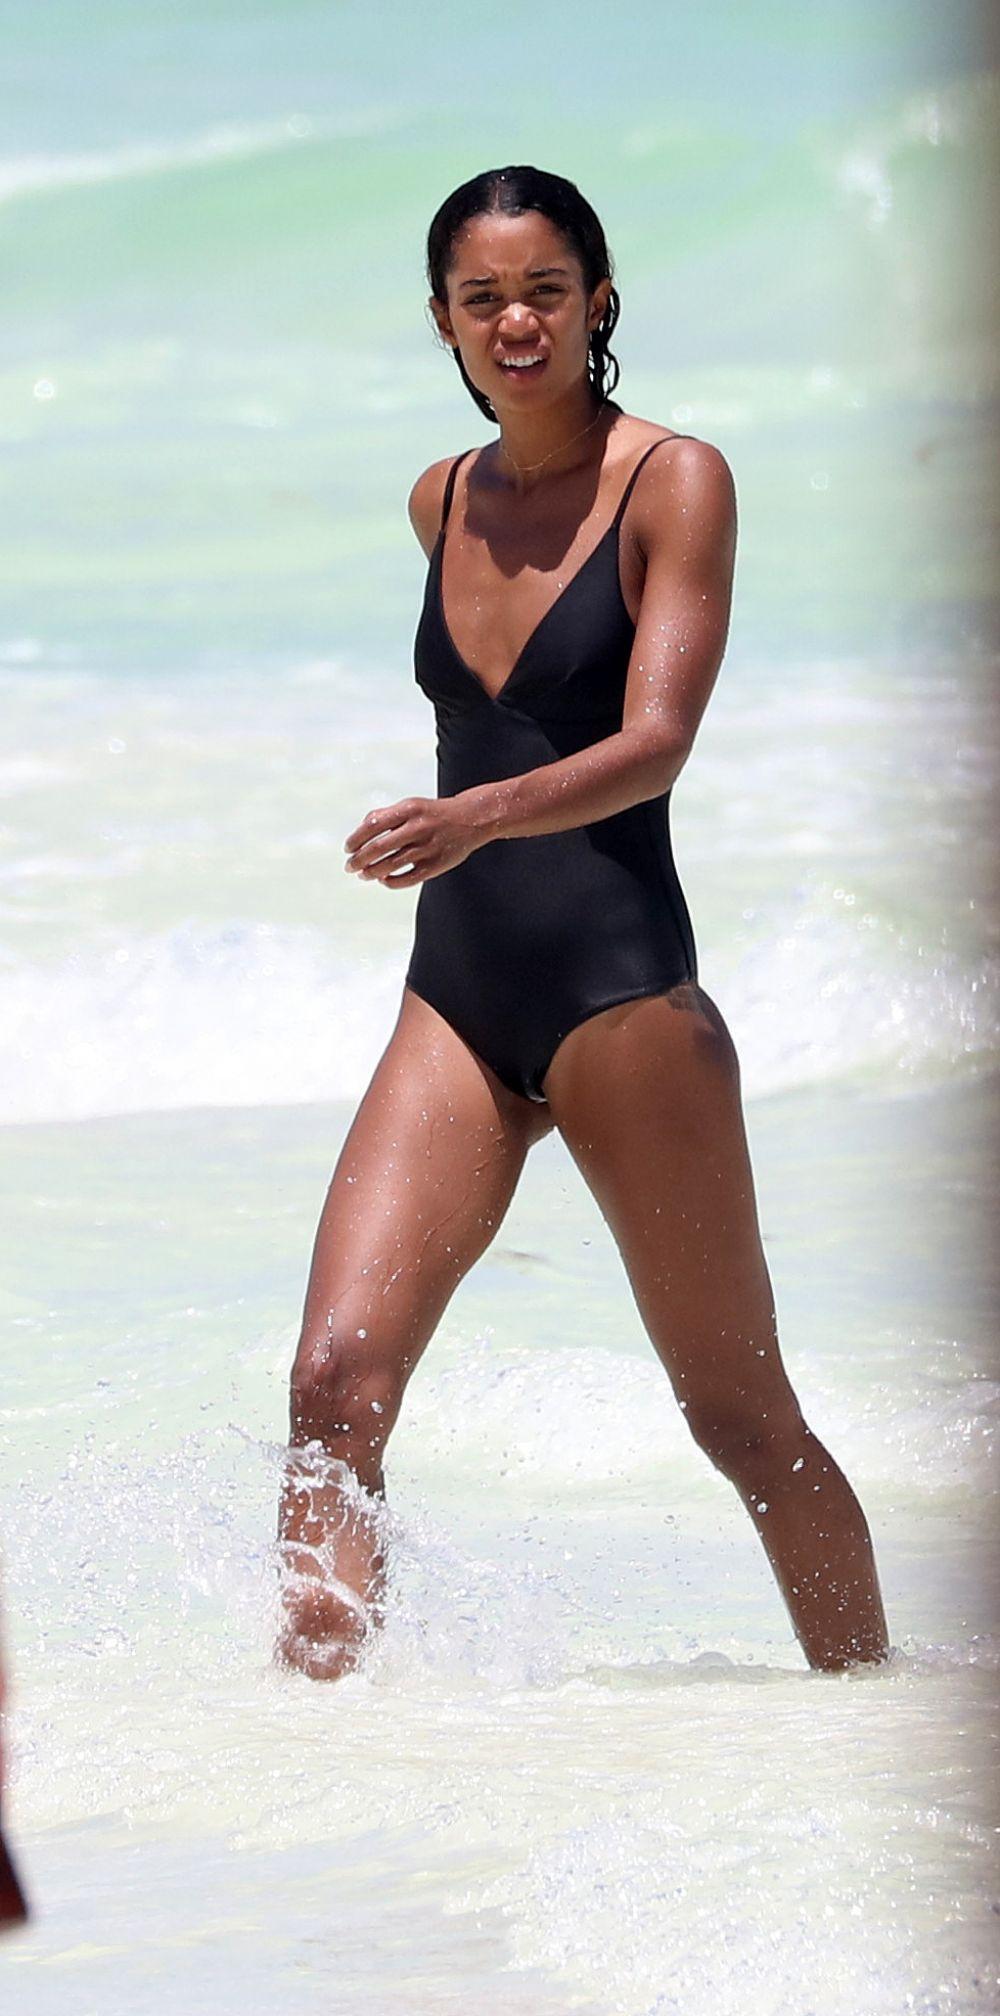 Bikini Laura Harrier nudes (99 images), Pussy